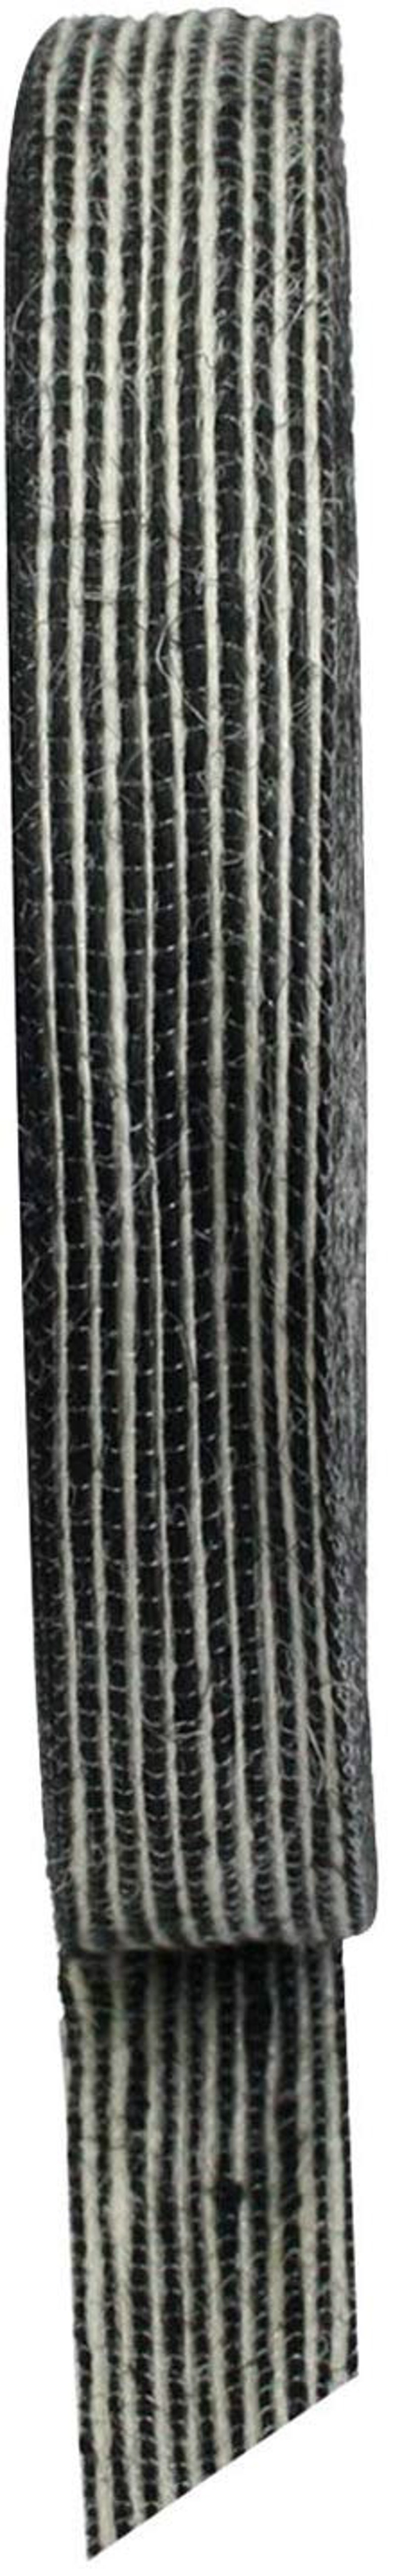 Black and White Stripes Burlap Jute Fabric Ribbon Roll Gift Wrap Present Decoration DIY Hessian Craft Supply 25 mm x 50 yards